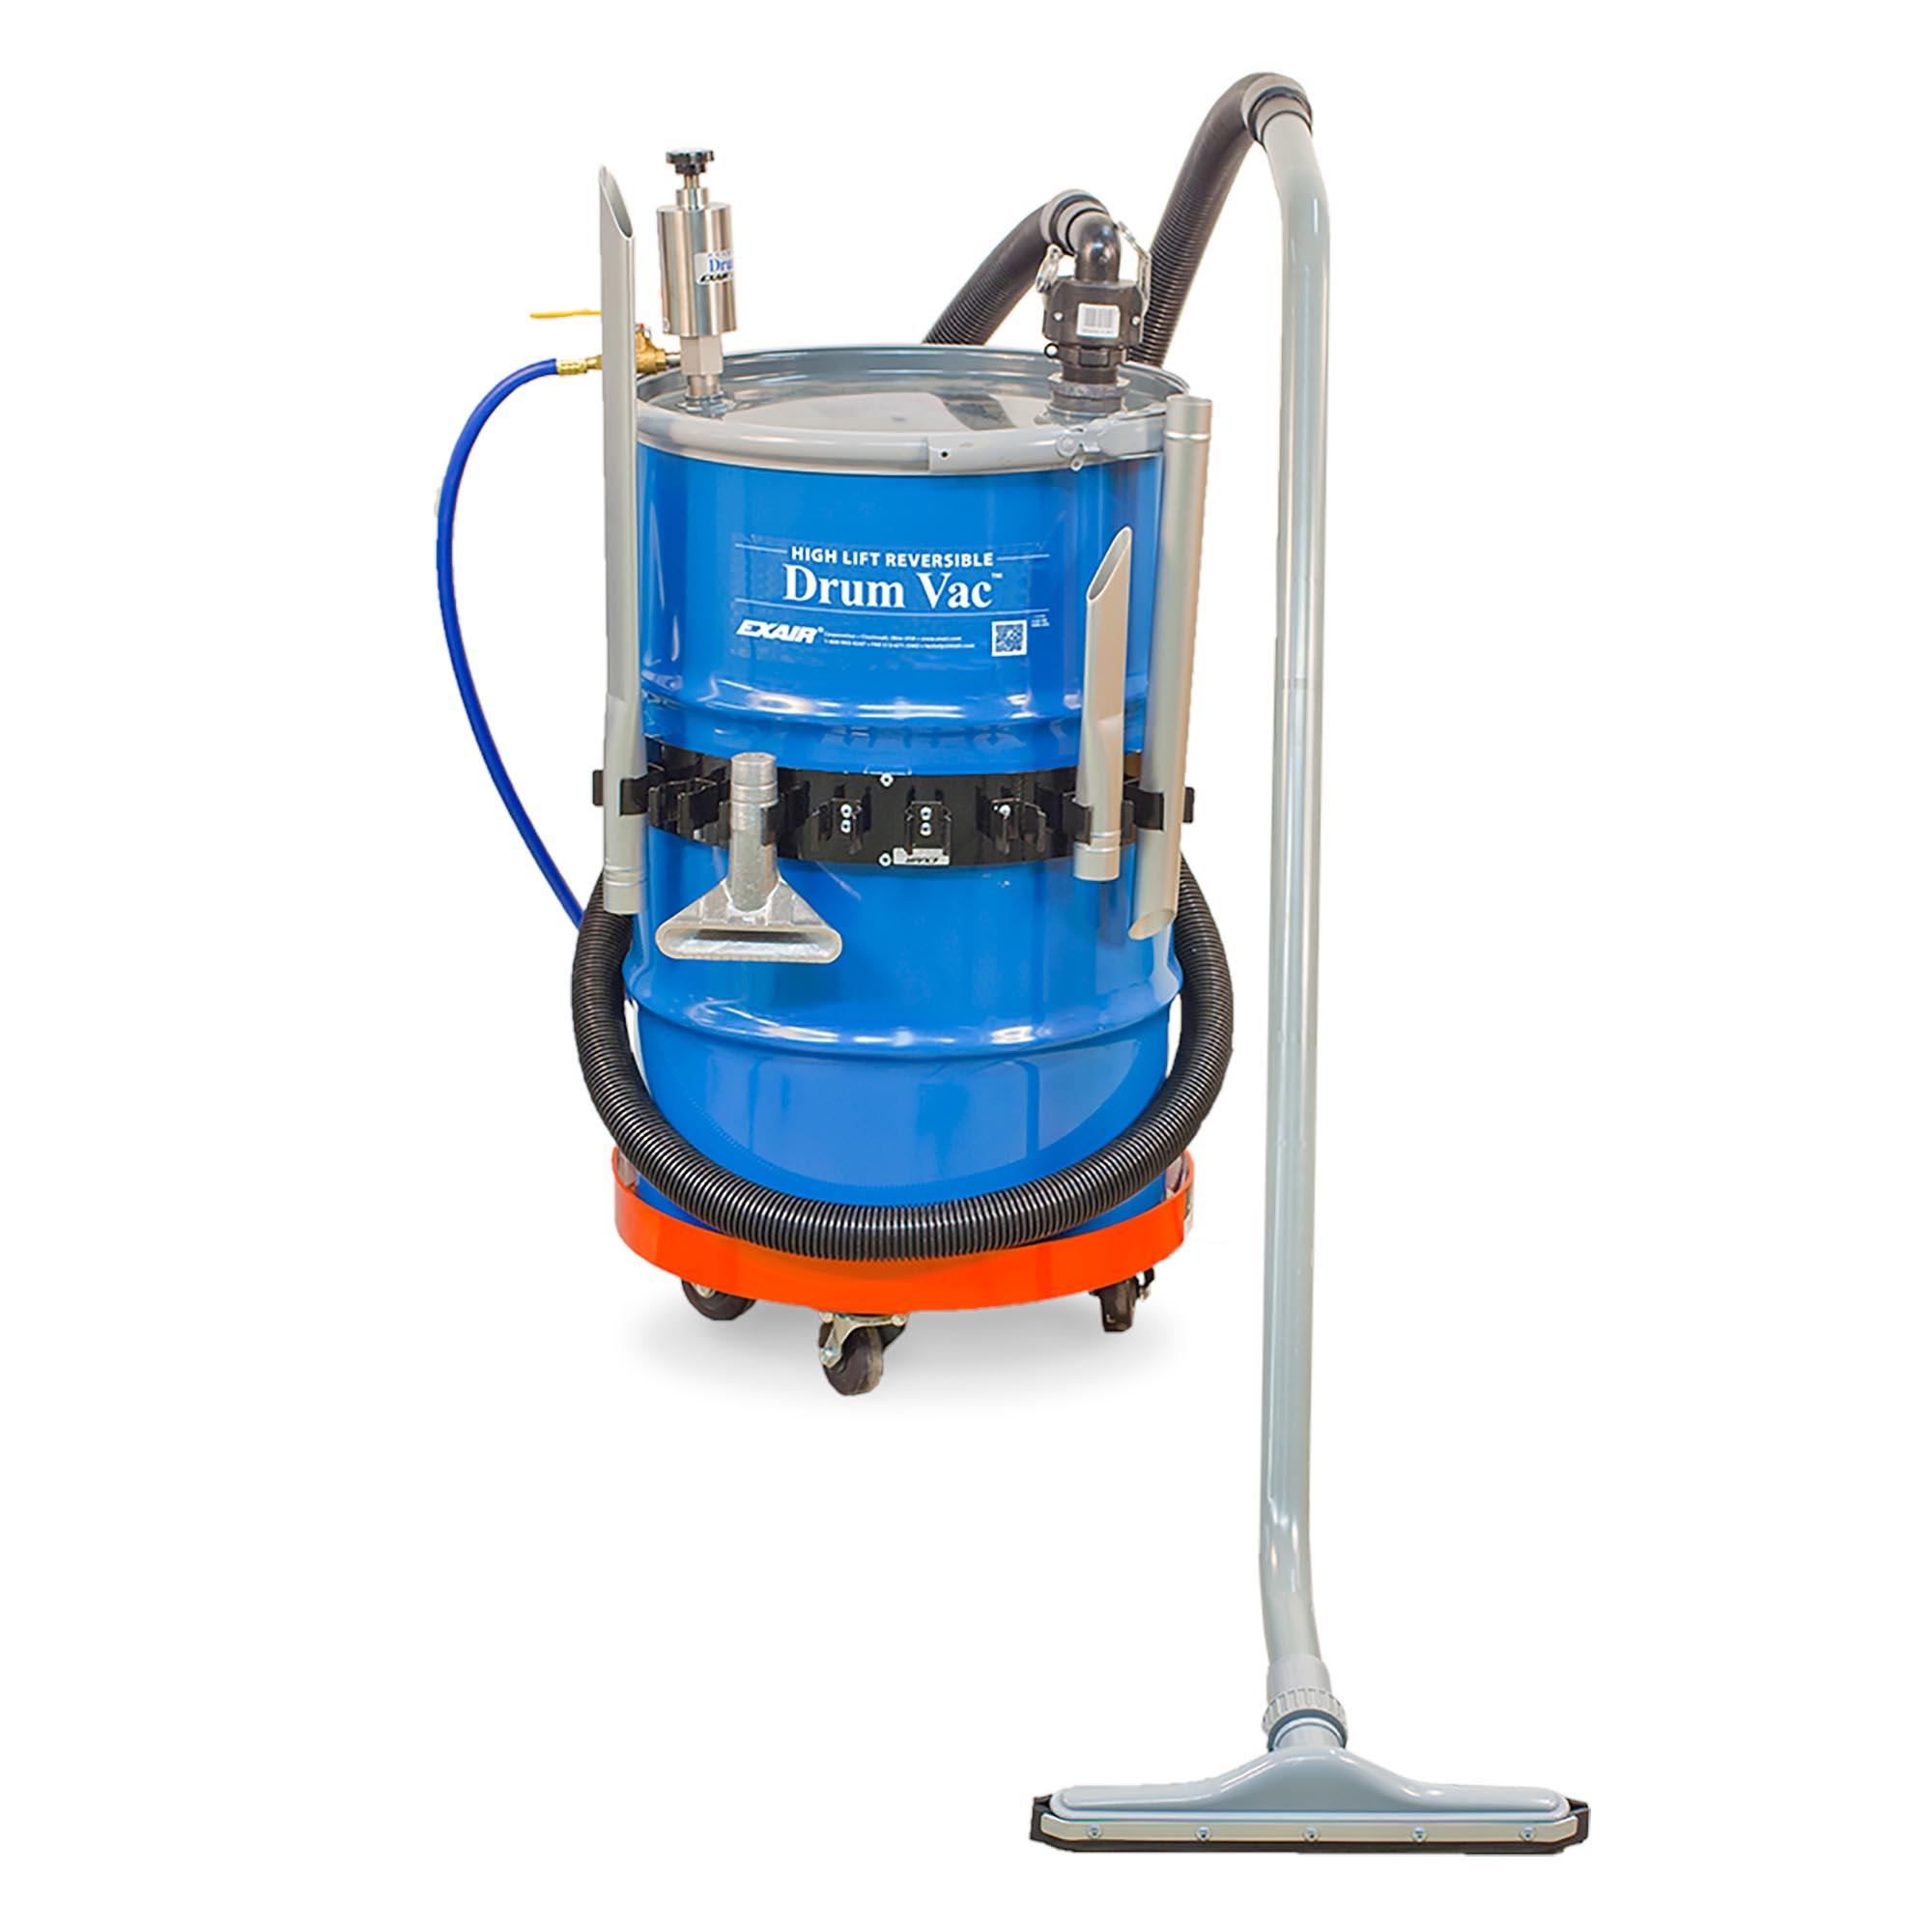 Model 6195-30 30 Gallon High Lift Reversible Drum Vac System